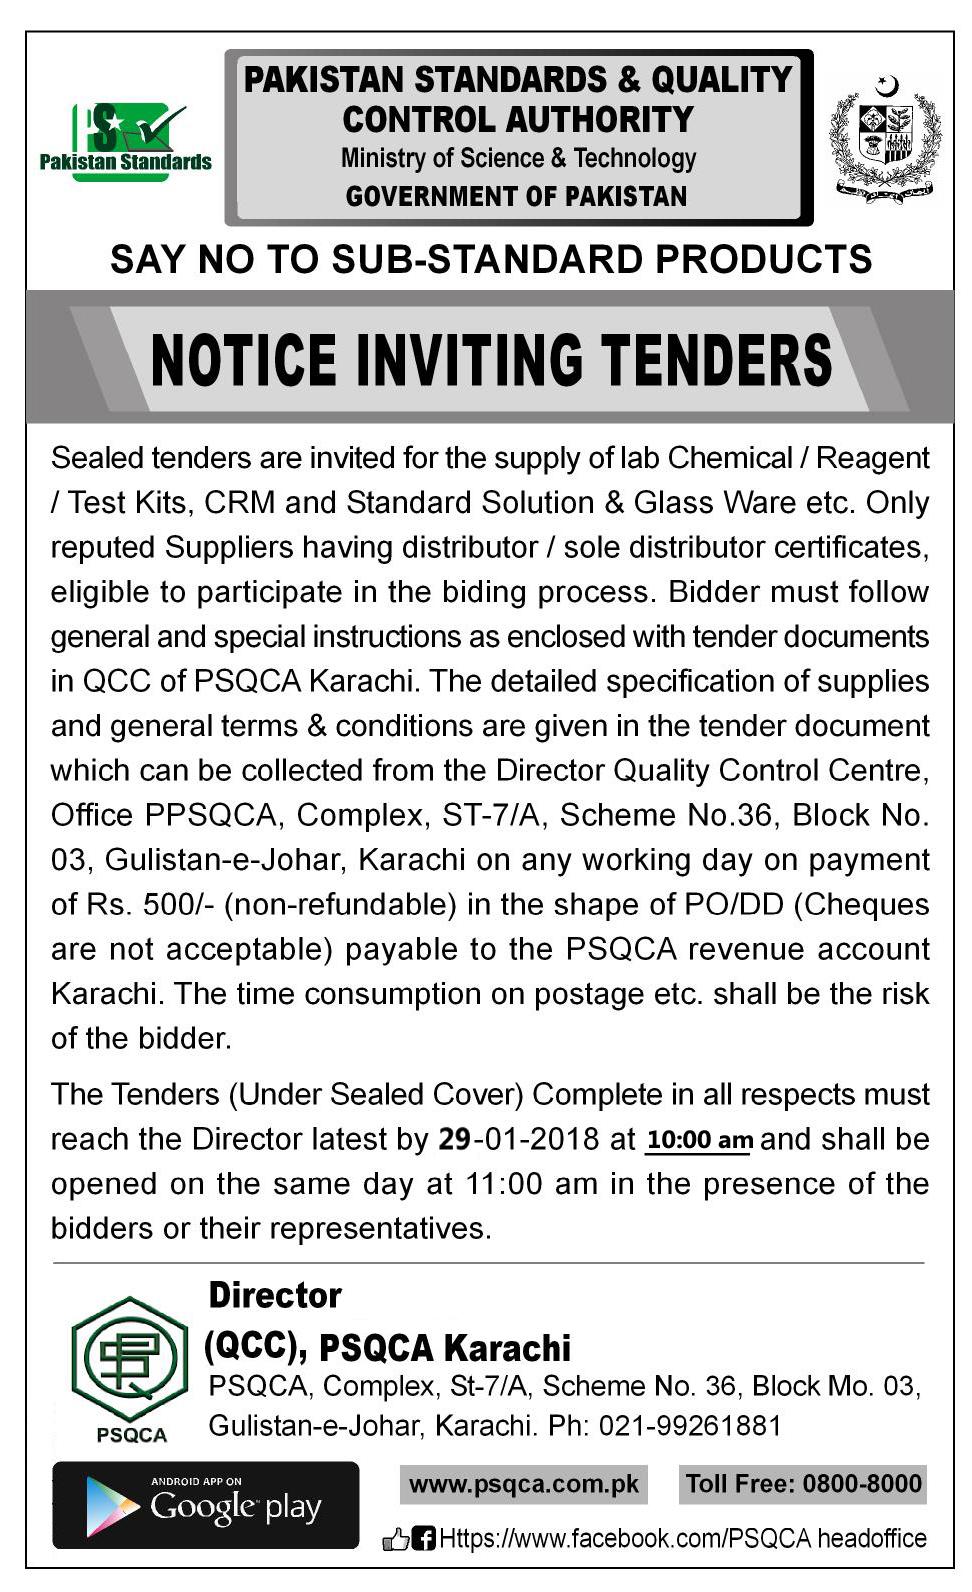 tenders development sector pakistan